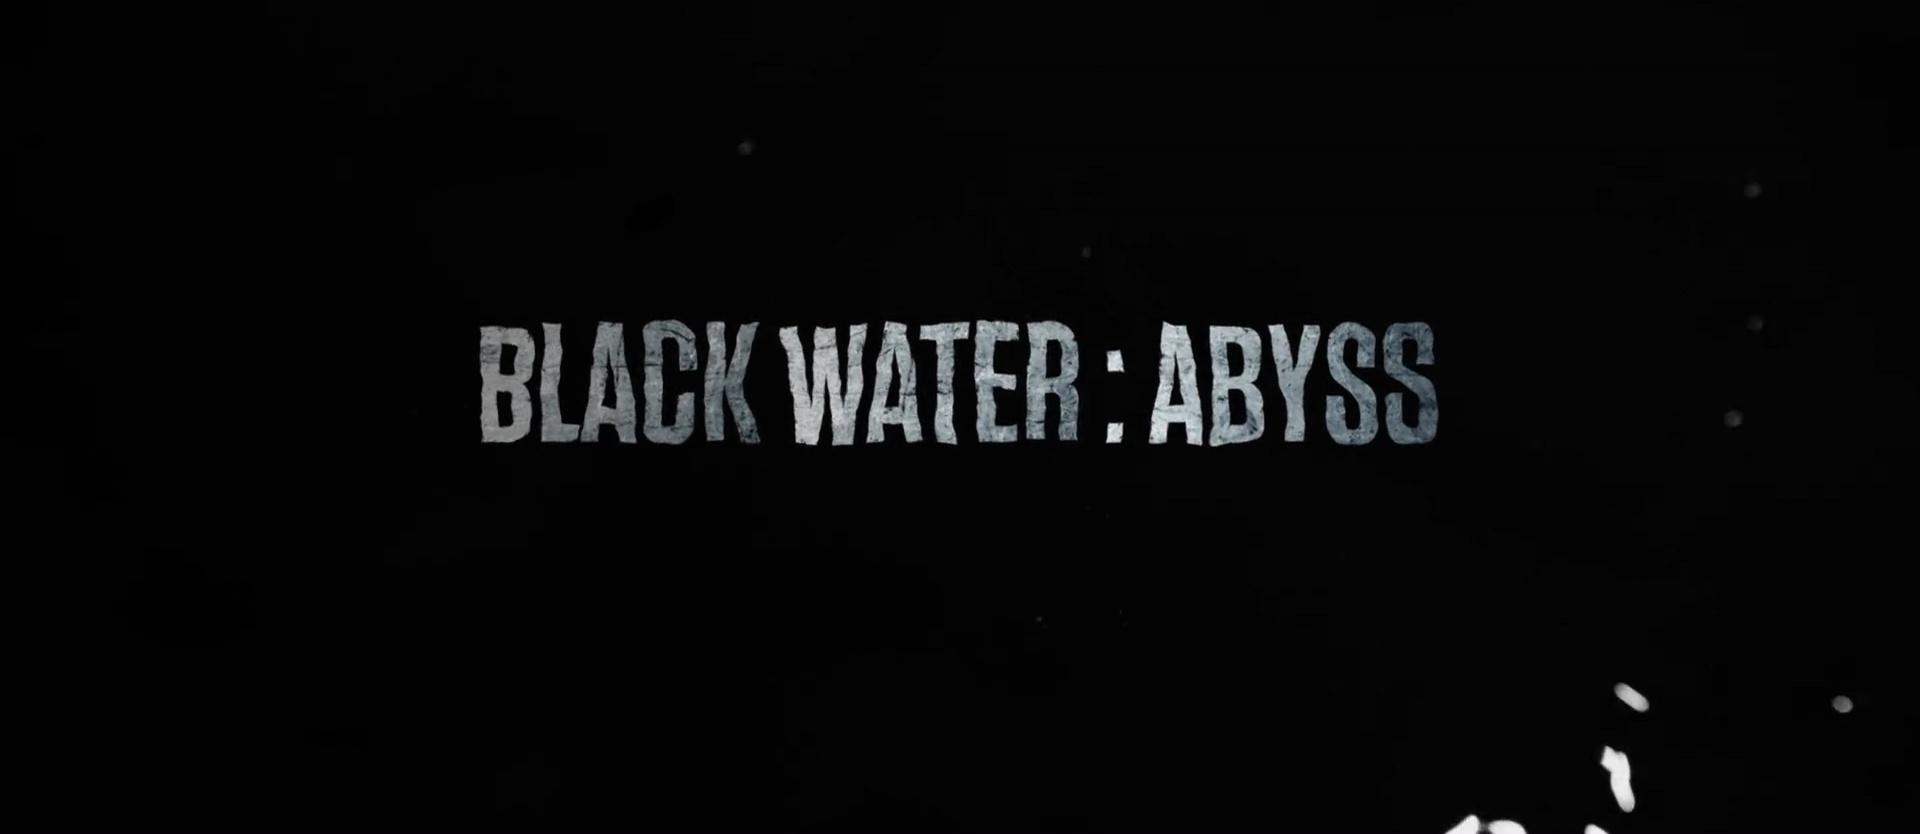 BLACK WATER ABYSS de Andrew Traucki (2020)